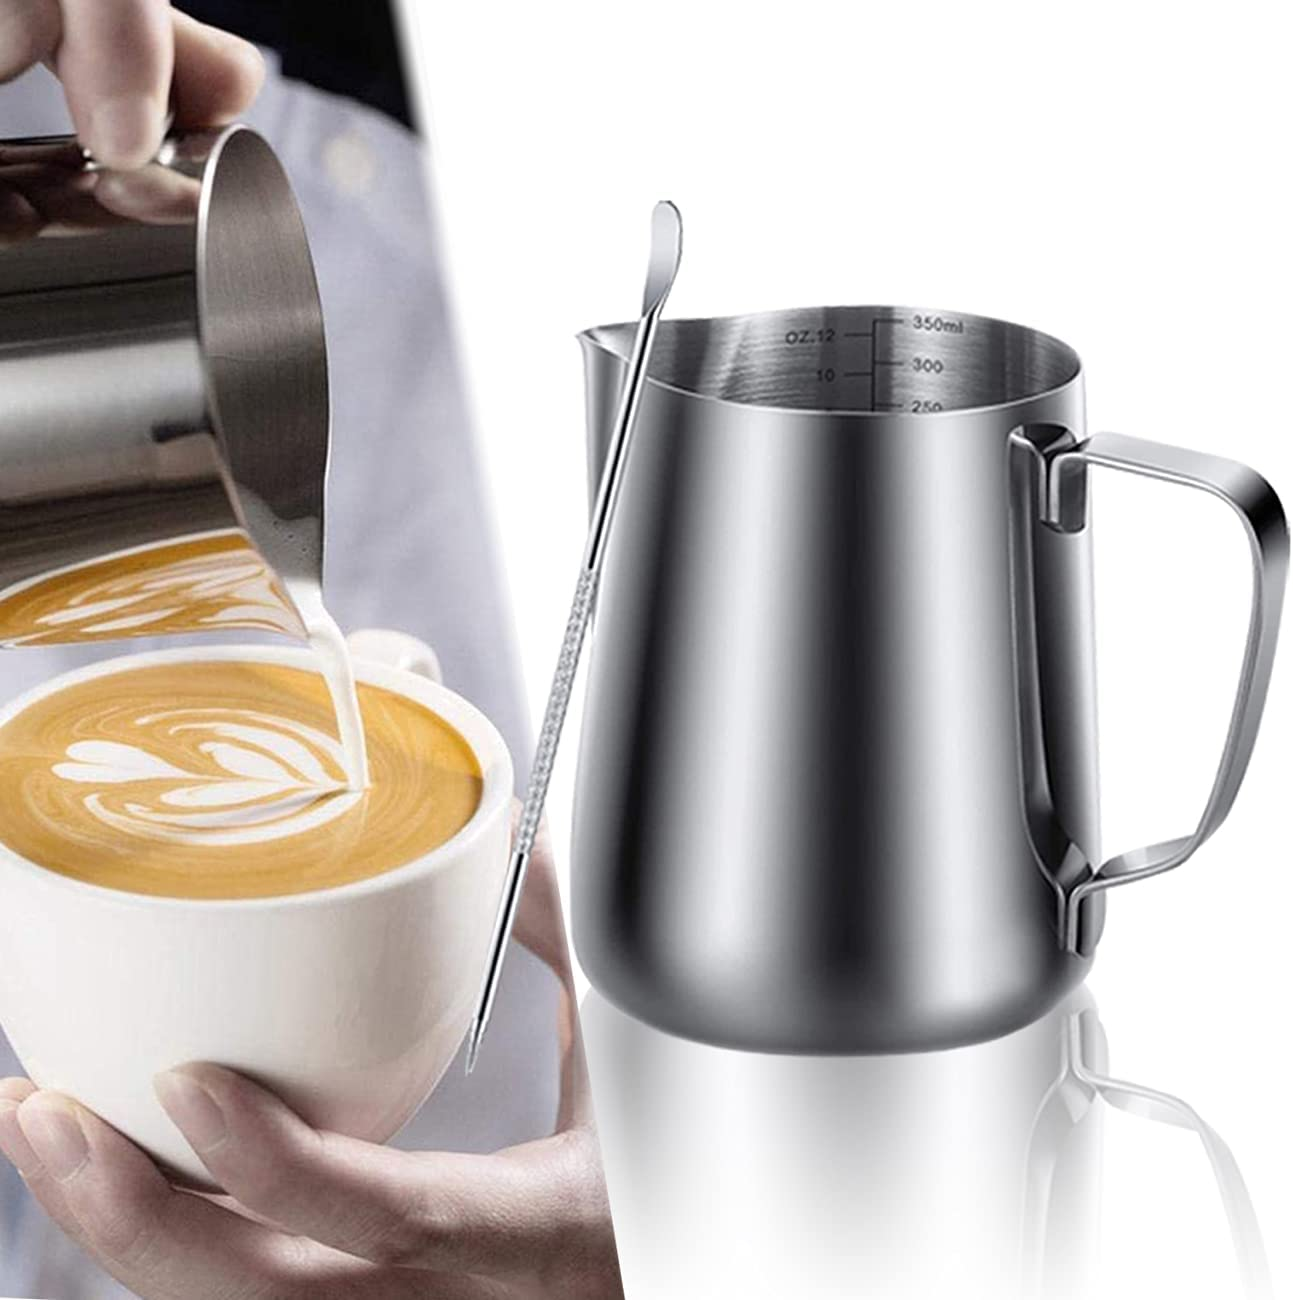 Milk Frothing Pitcher 12oz / 350ML Espresso Steaming Pitcher,wit